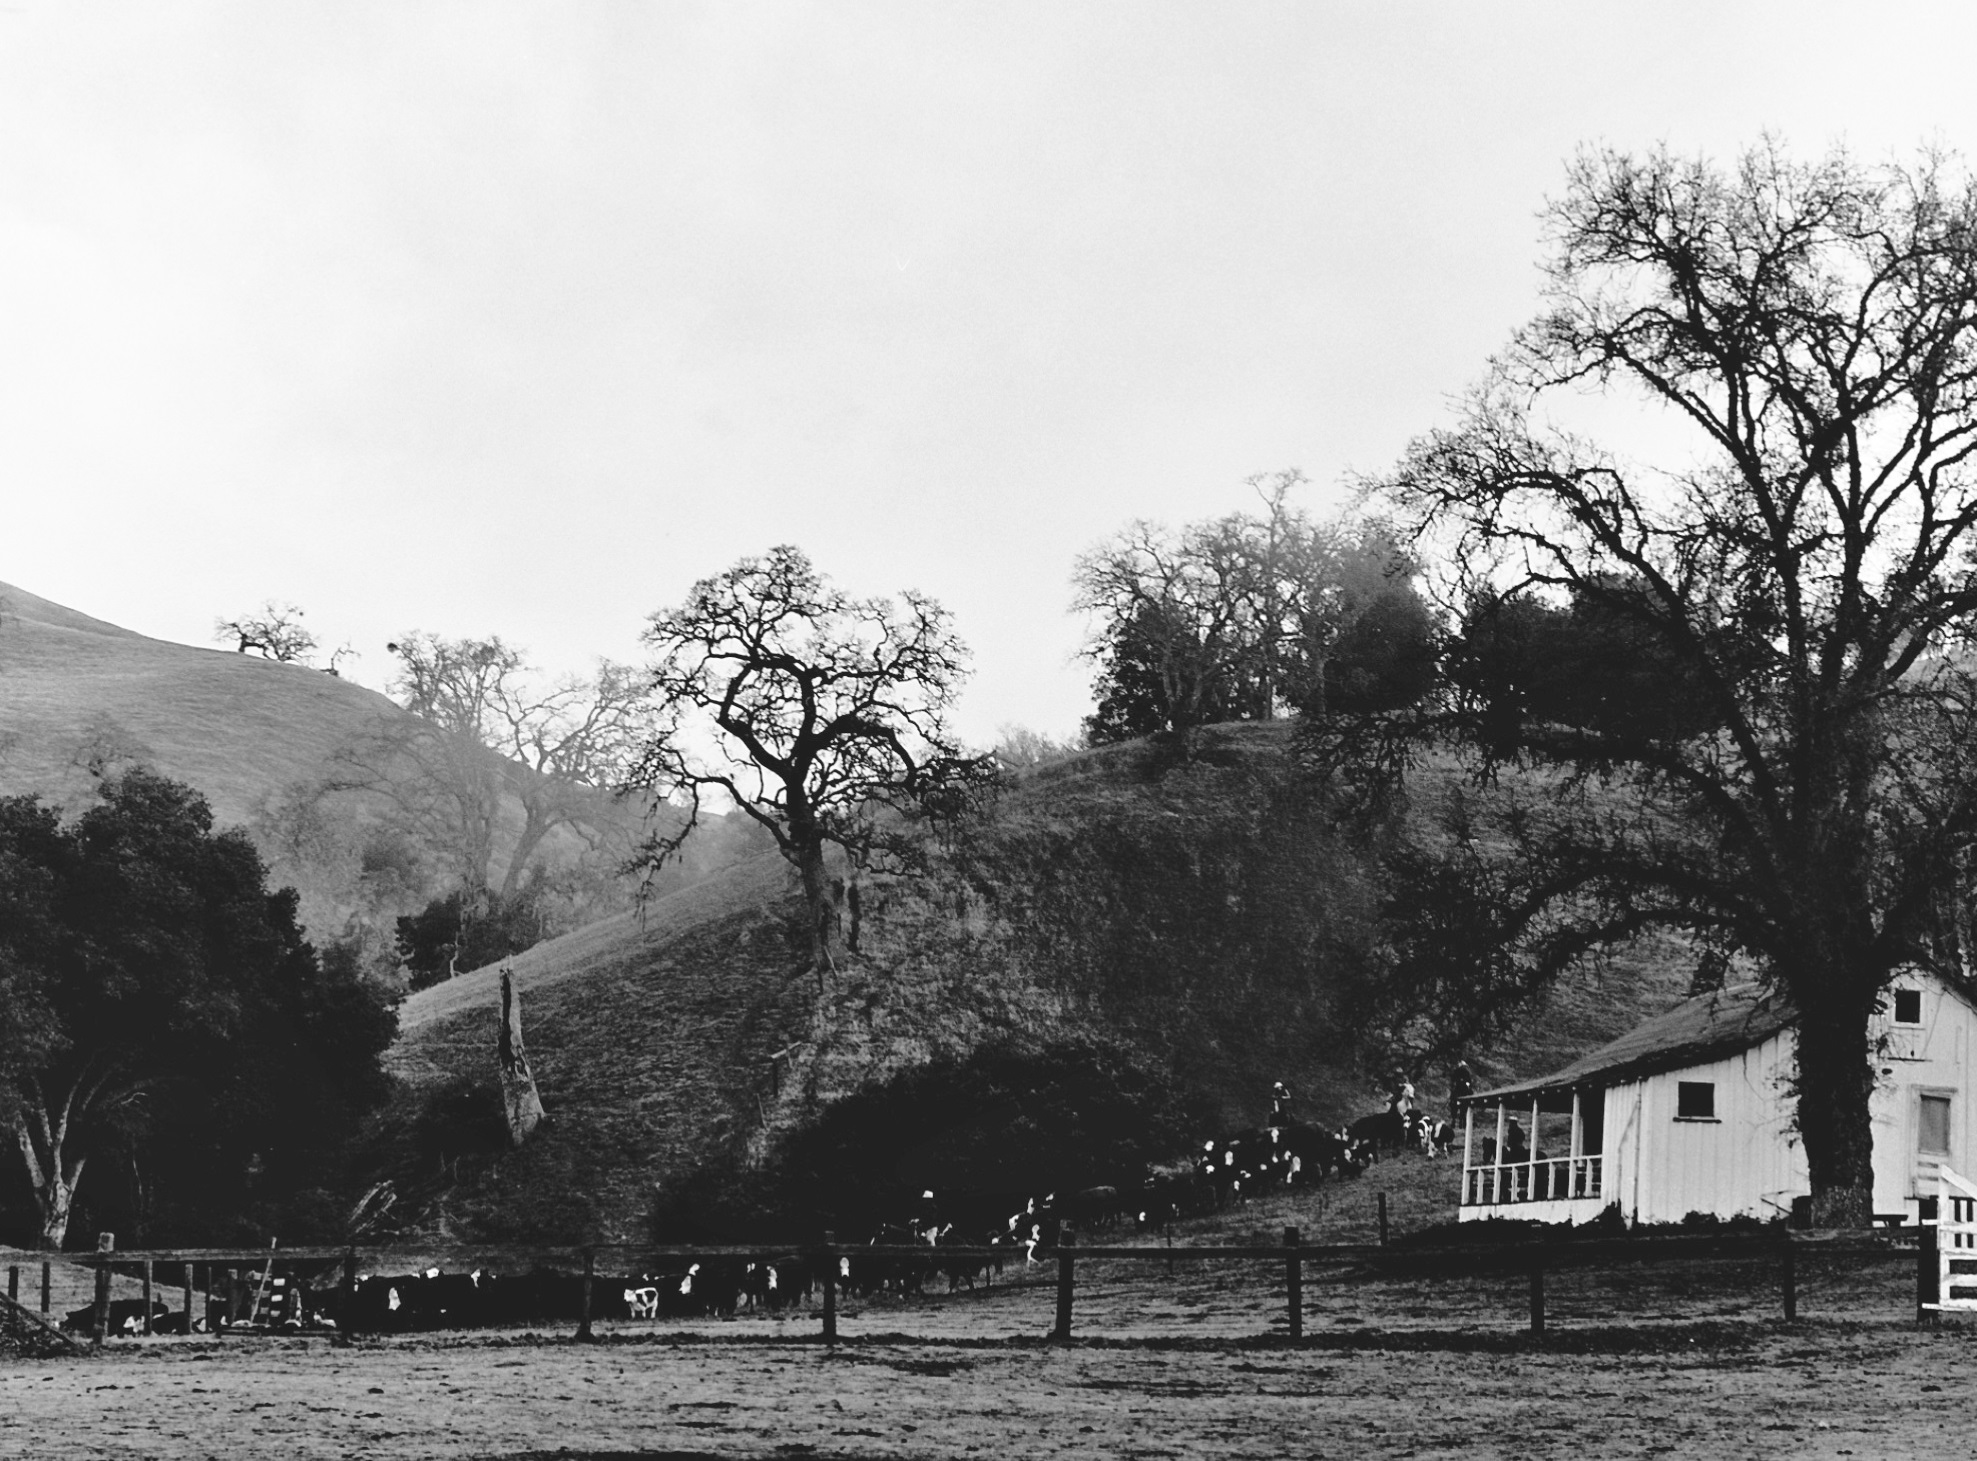 Photo Courtesy Carmel Valley Historical Society